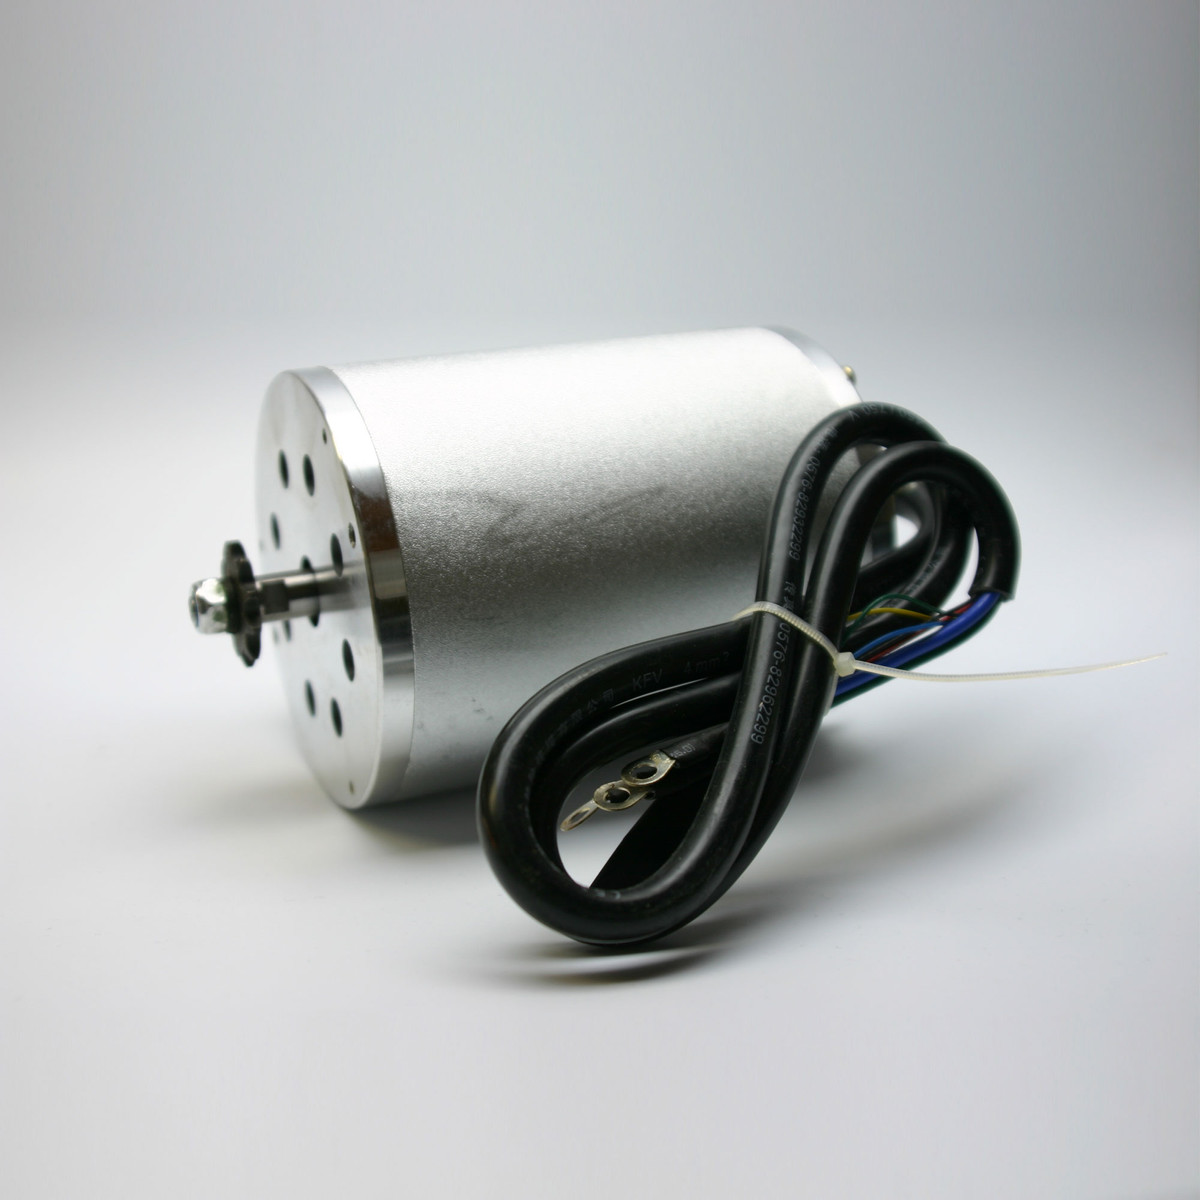 FORÇA EagleTec 1800W 36V Motor für CitySpeedster 3.0